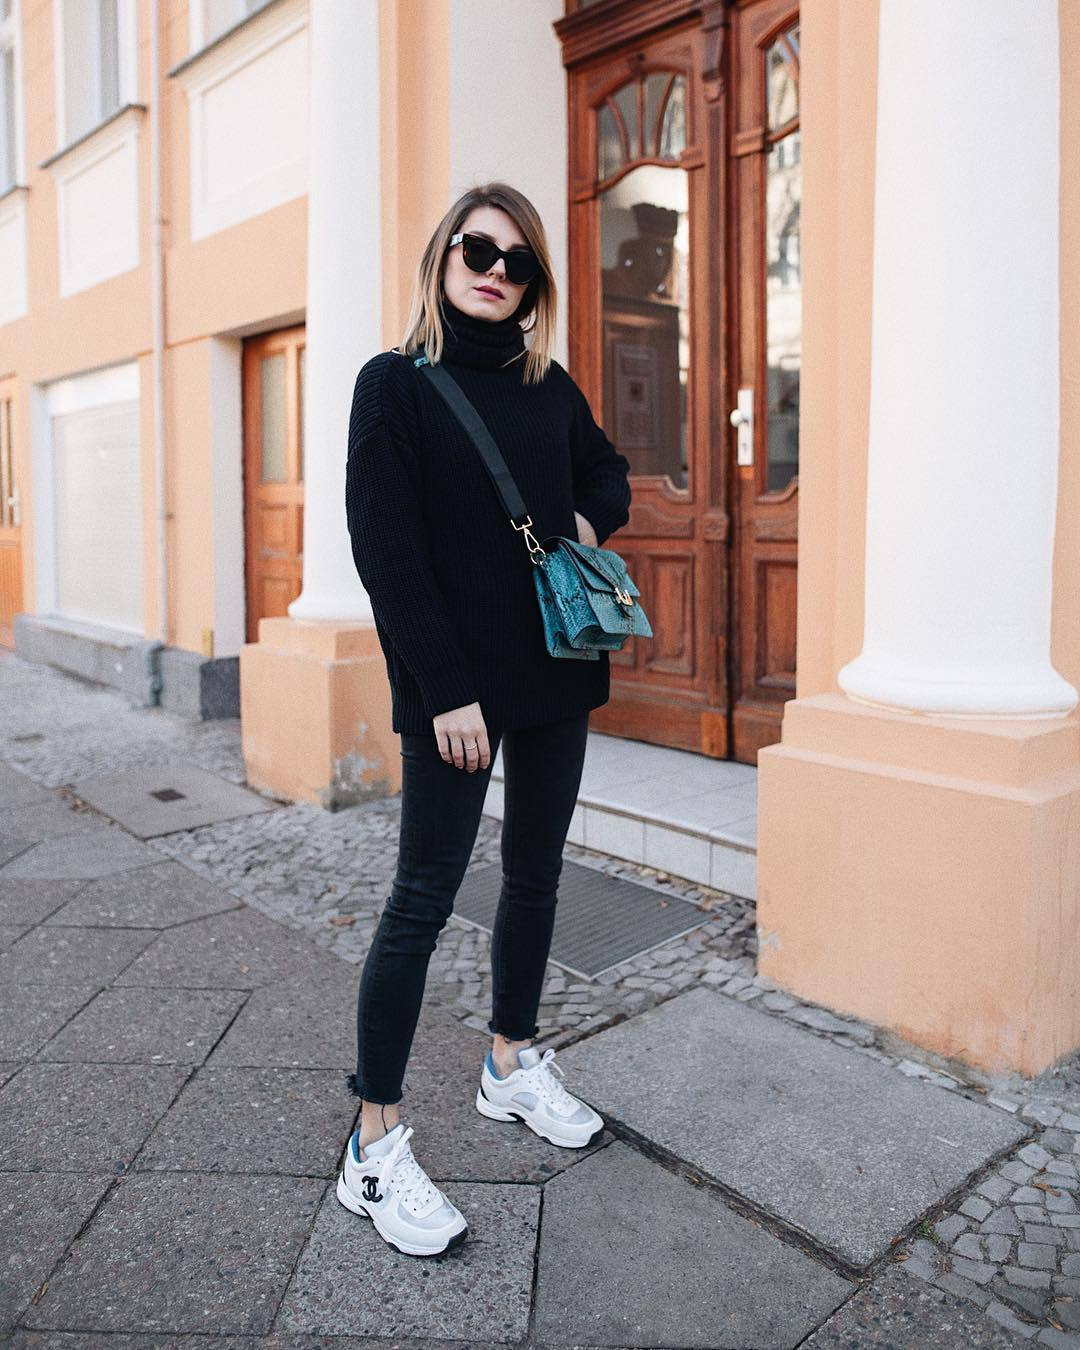 bag crossbody bag crocodile white sneakers chanel cropped jeans black skinny jeans black sweater turtleneck sweater